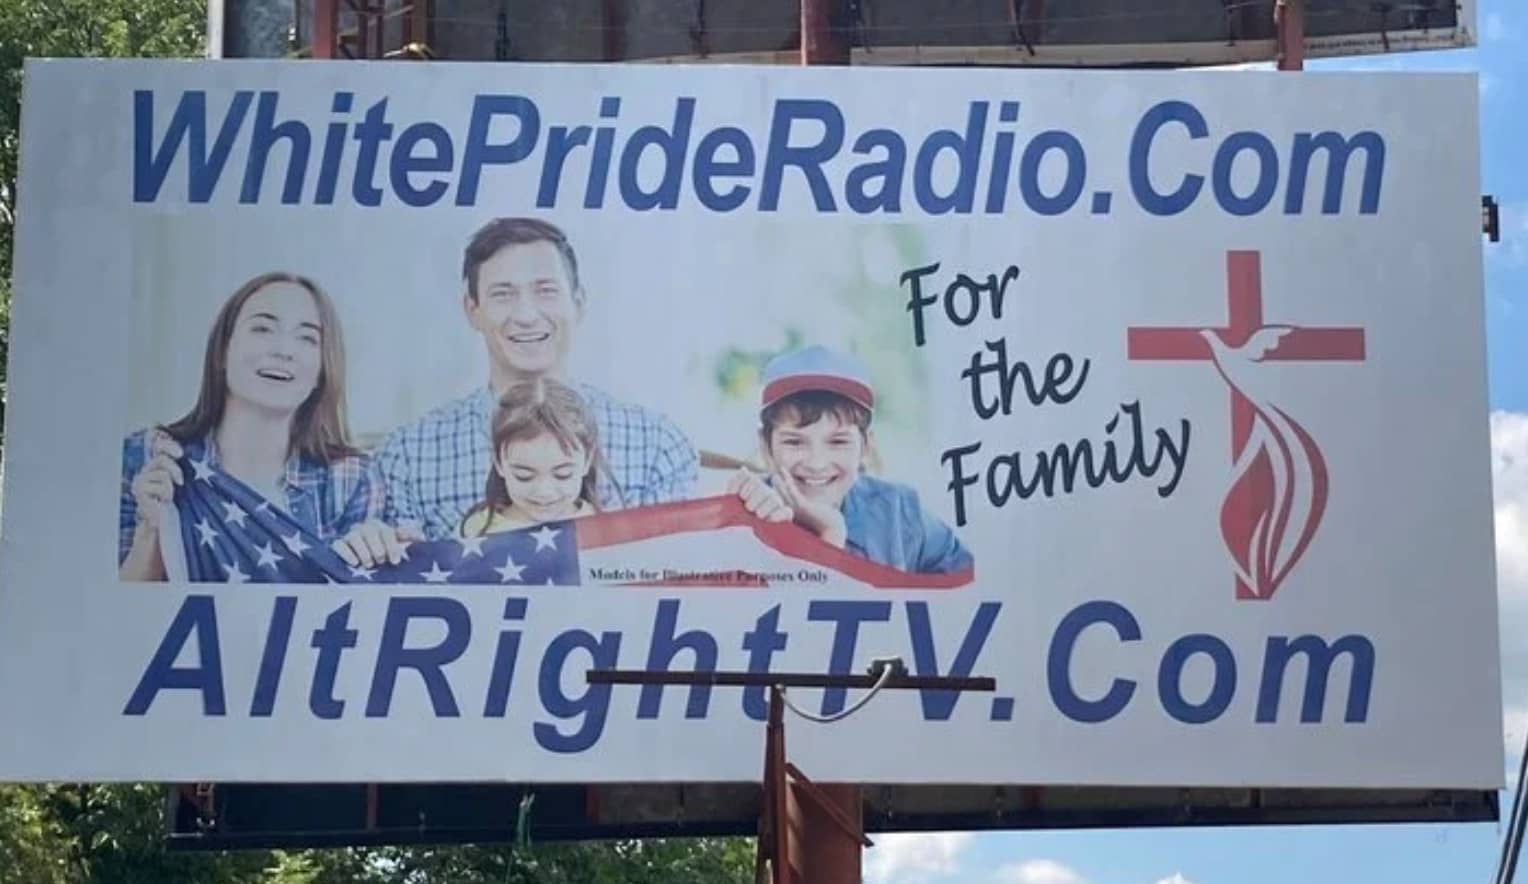 White Pride Radio Harrison